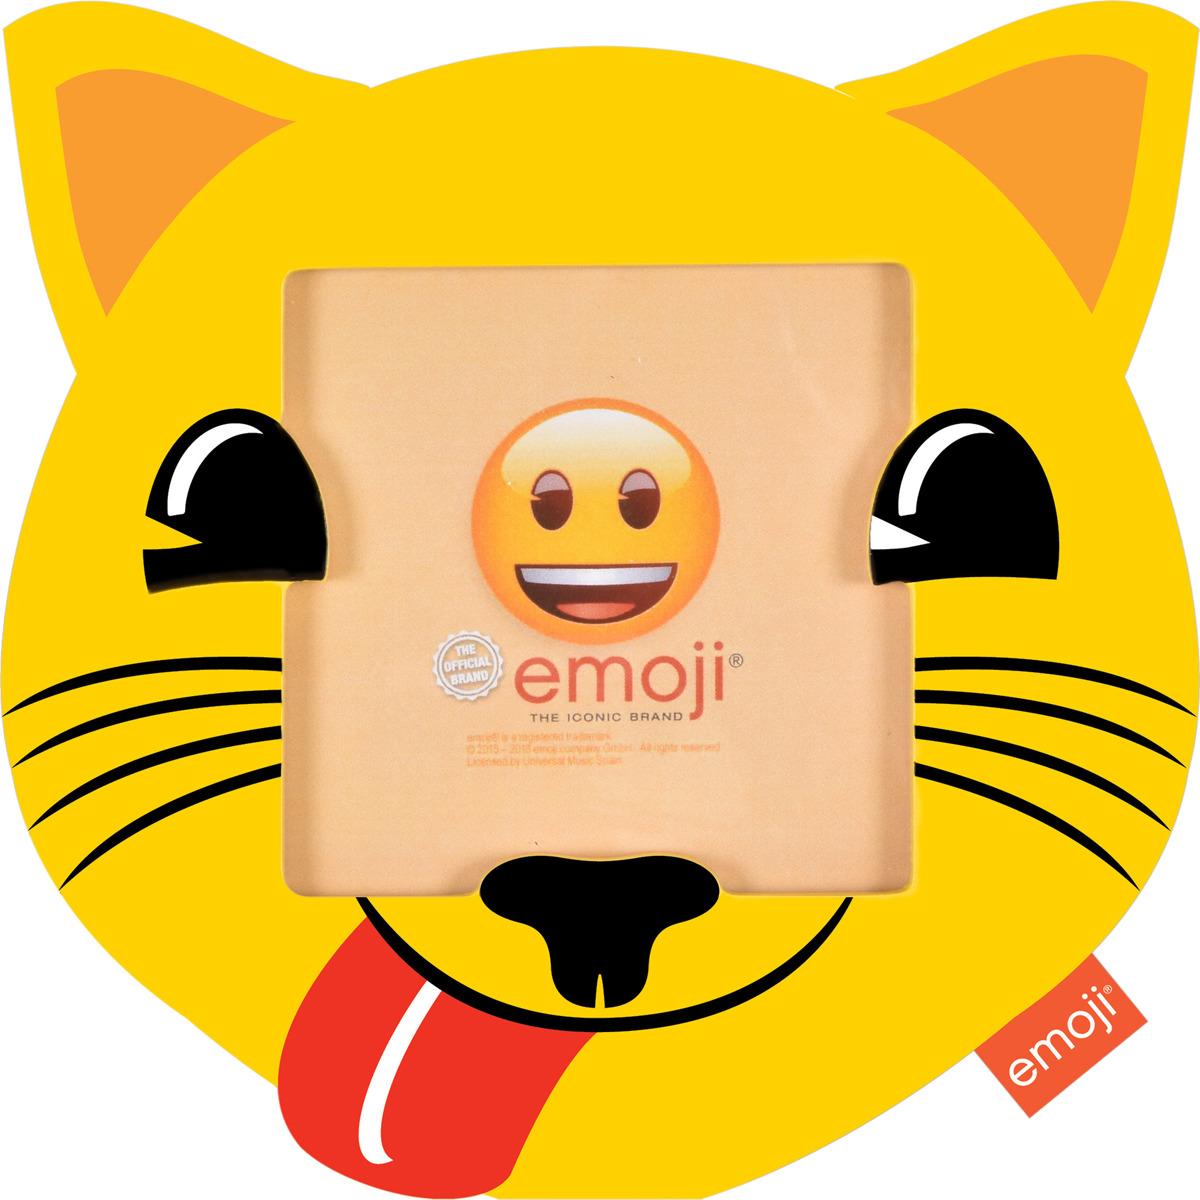 Фоторамка Innova Emoji Cat, 10 х 10 см